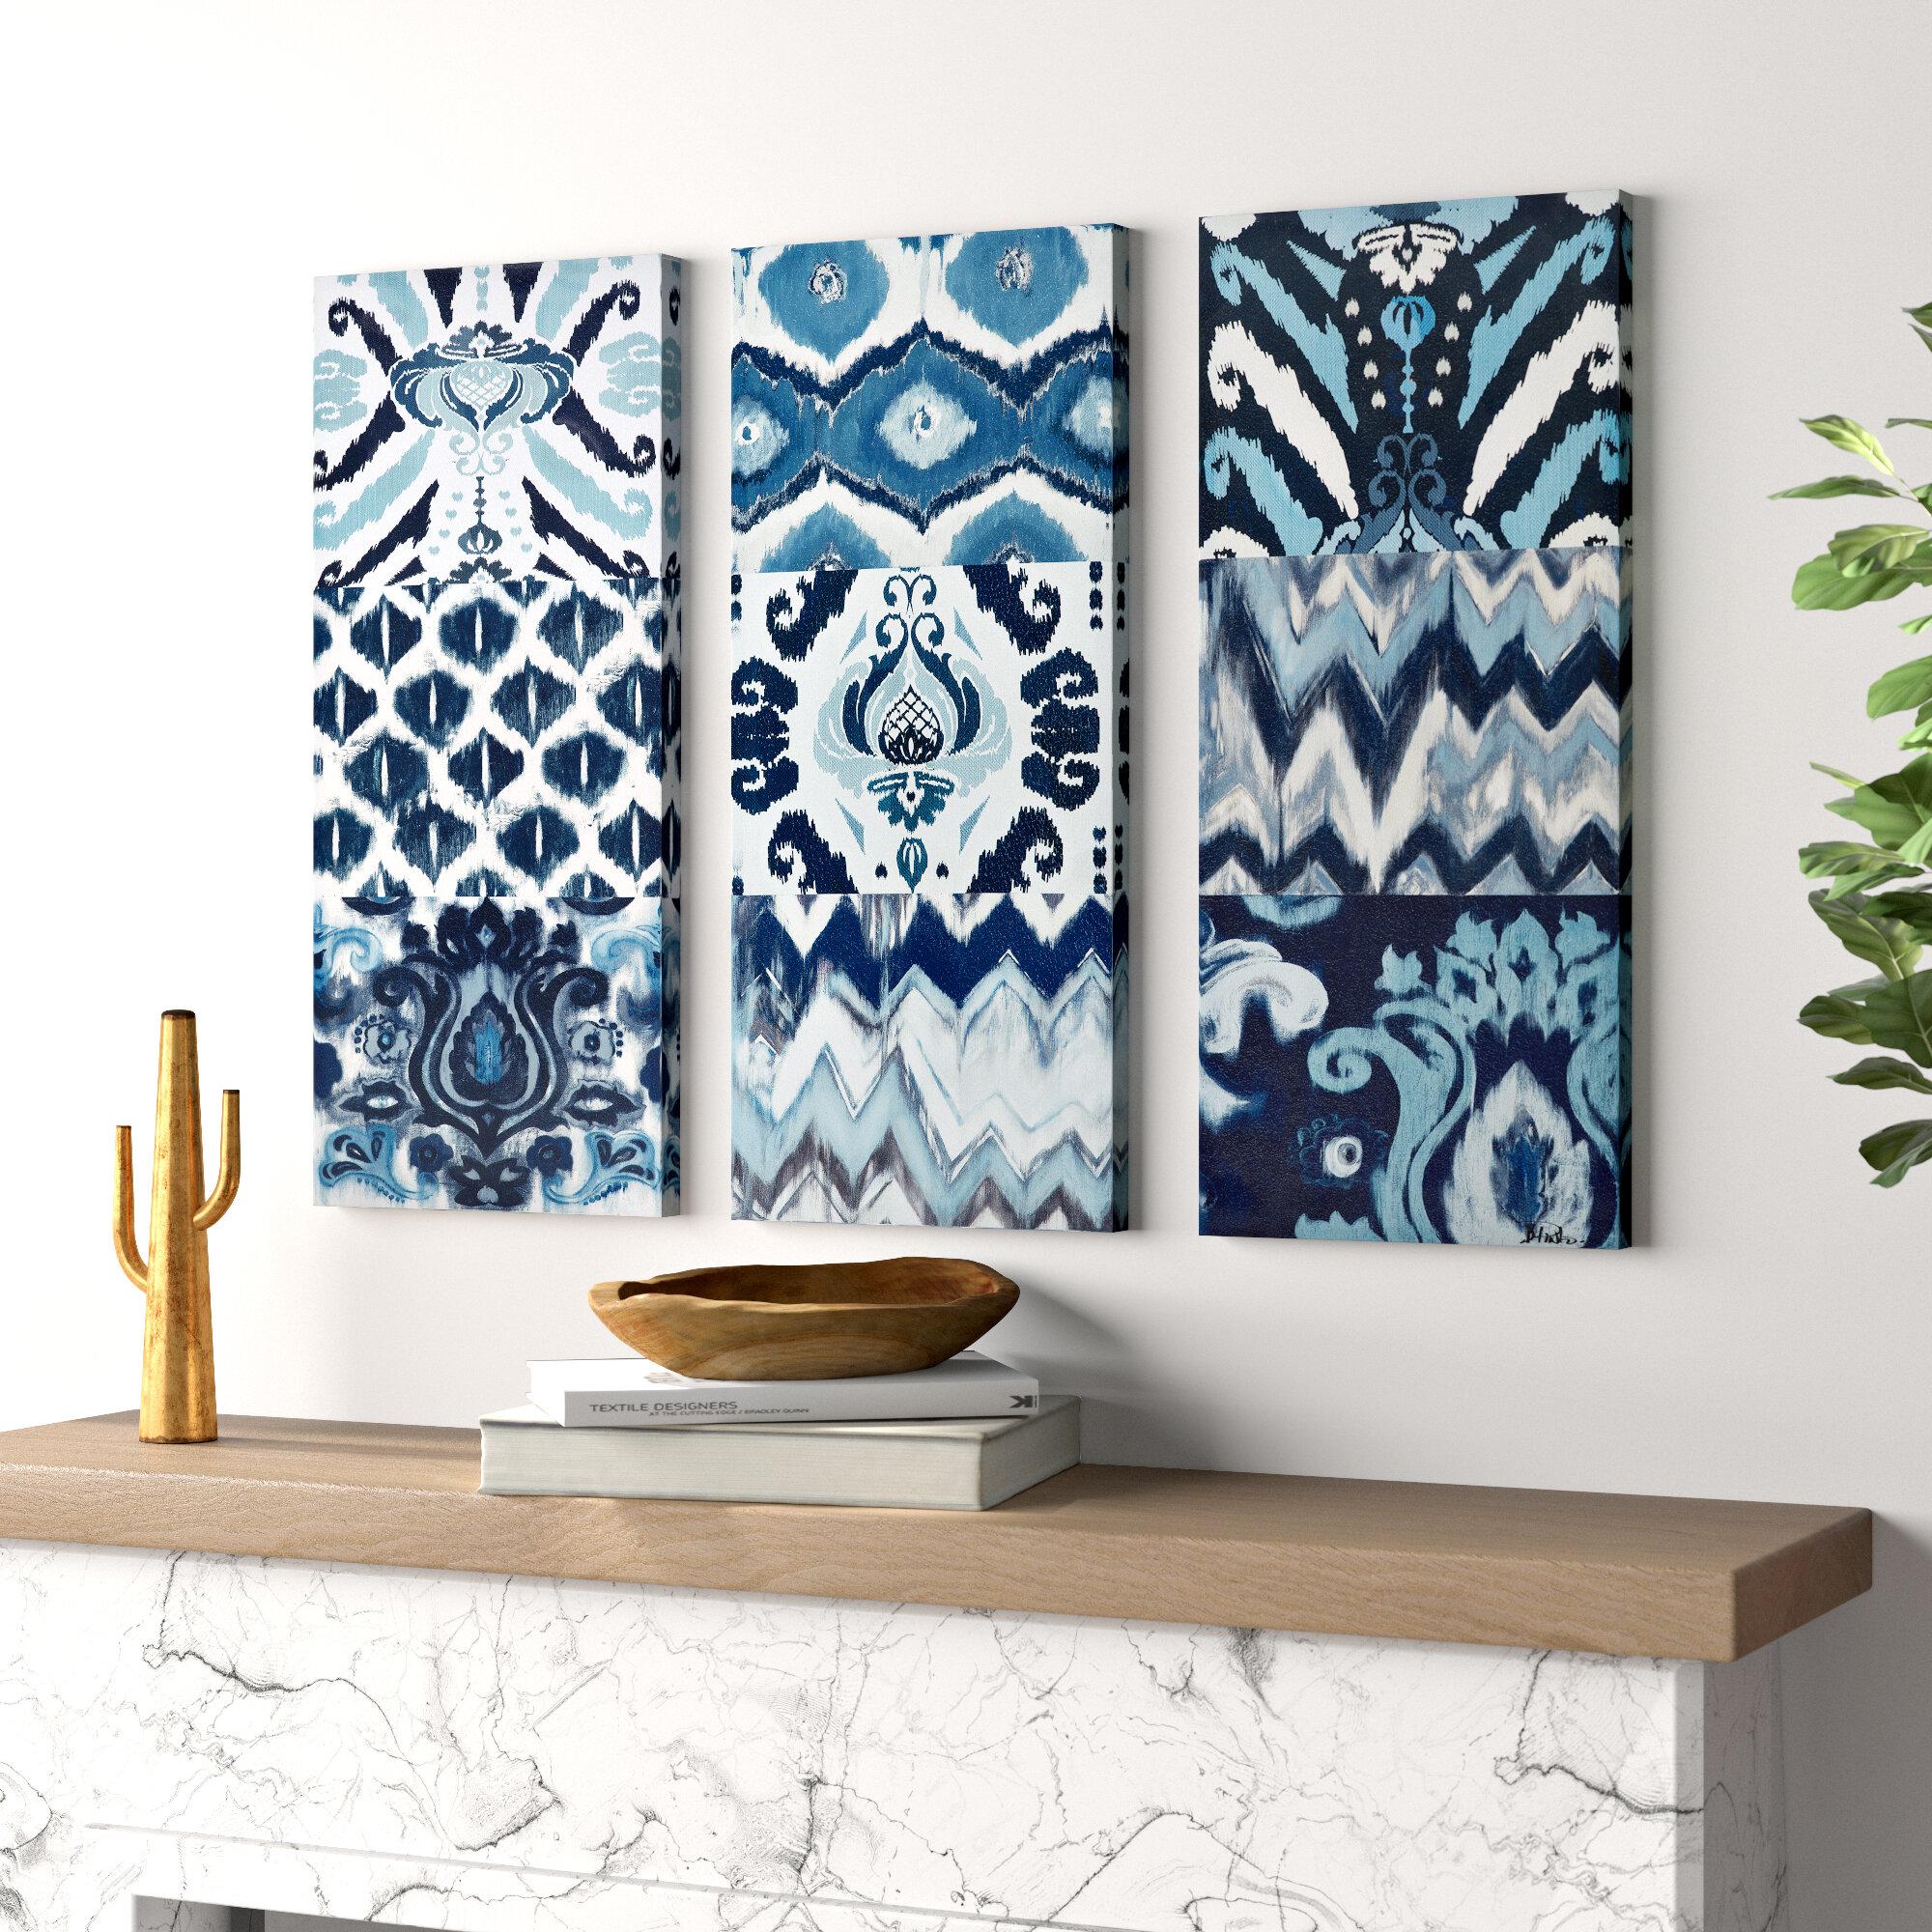 Mistana Flourish Ikat 3 Piece Graphic Art Print Set On Wrapped Canvas In Blue Reviews Wayfair